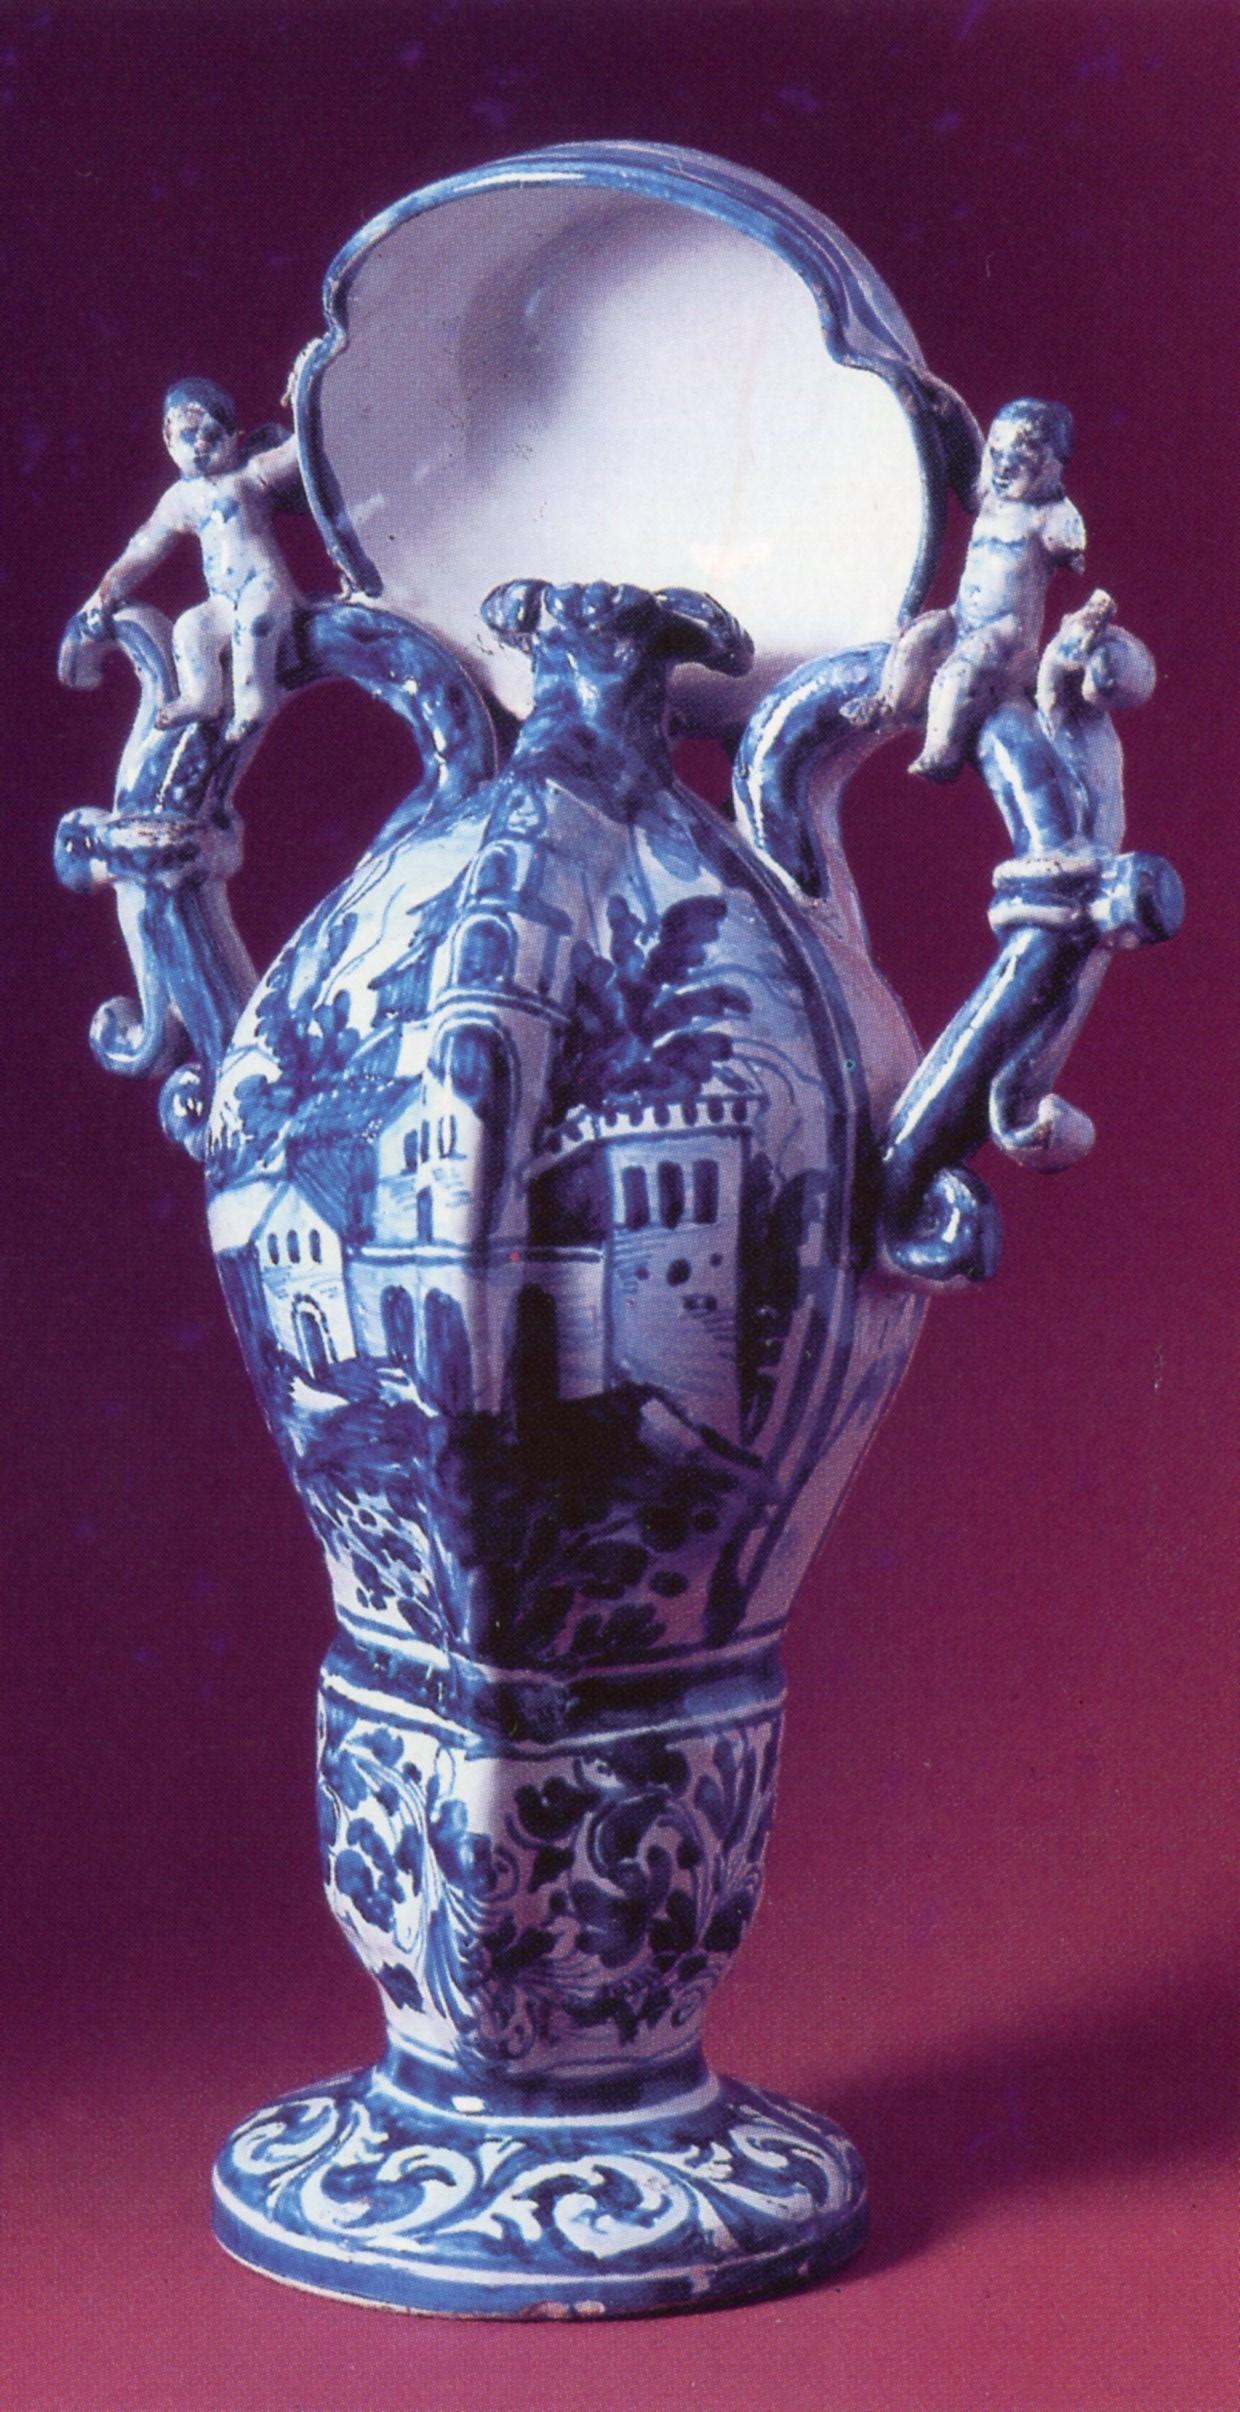 "Ceramica popolare, Lampada notturna per cacciatori (""bacucco""), sec. XVIII, manifattura di Cerreto Sannita, Campania"